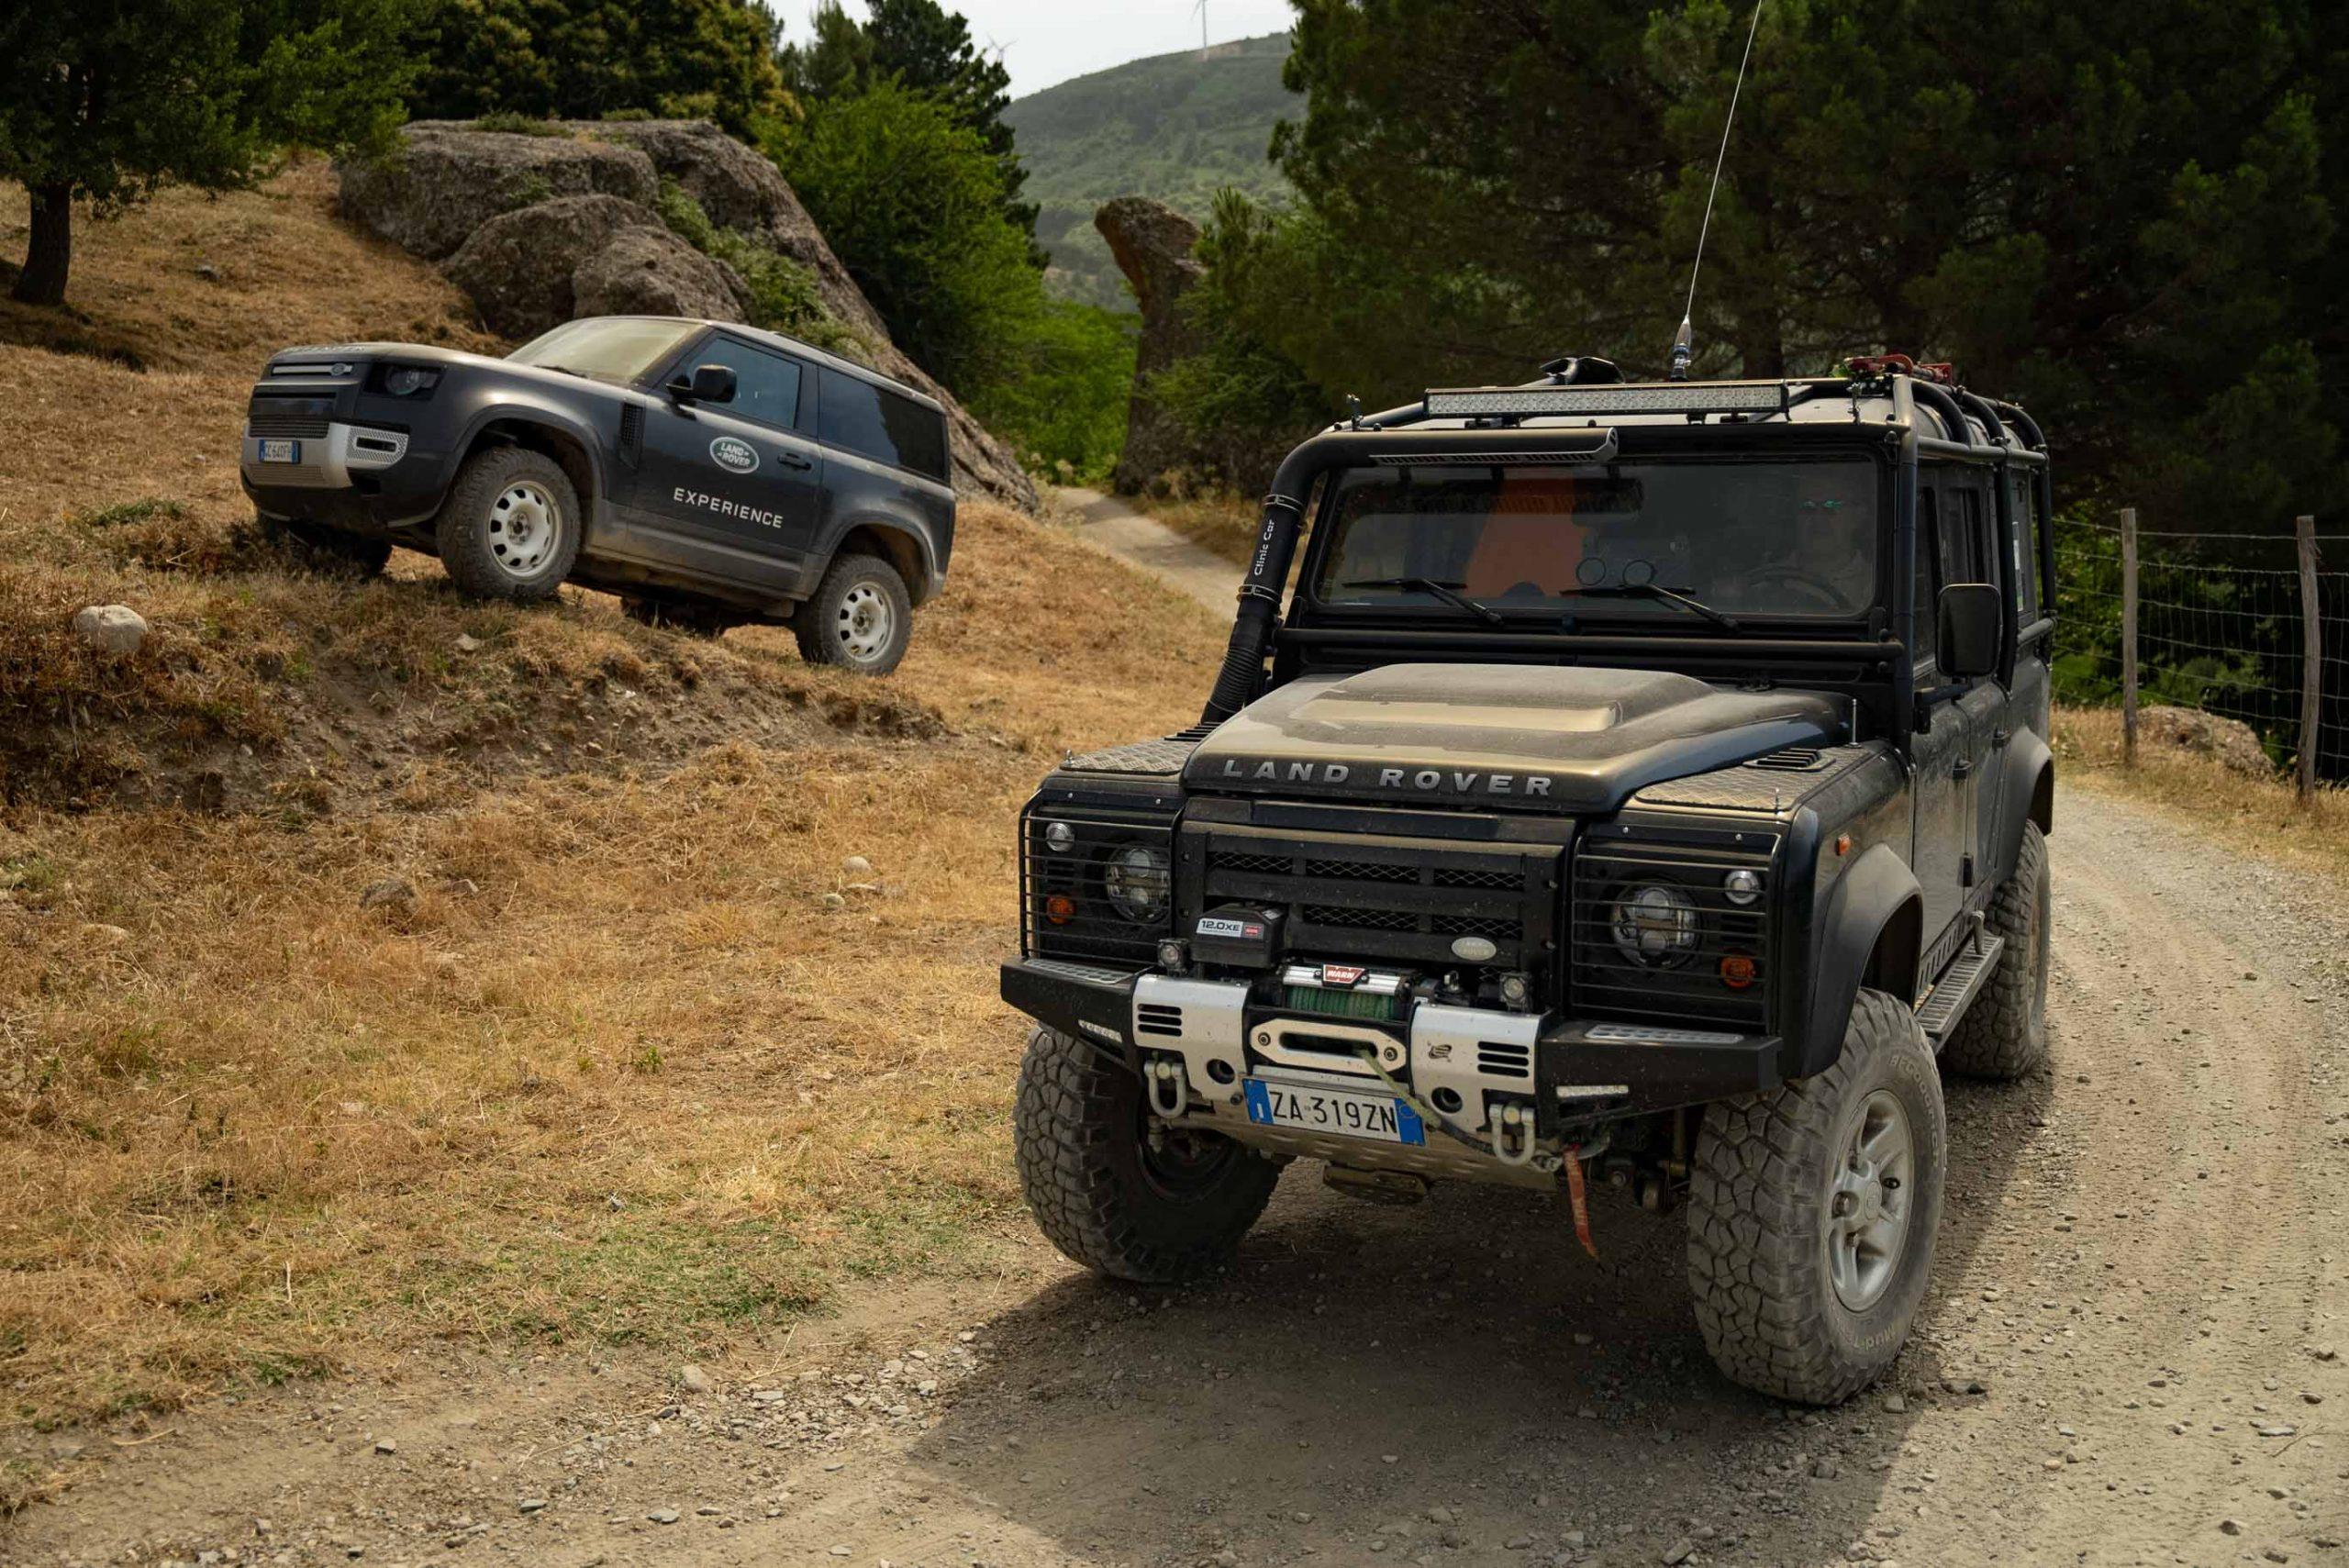 Land_Rover_Tour_Sicilia_2021_Land_Rover_Experience_Italia_-18